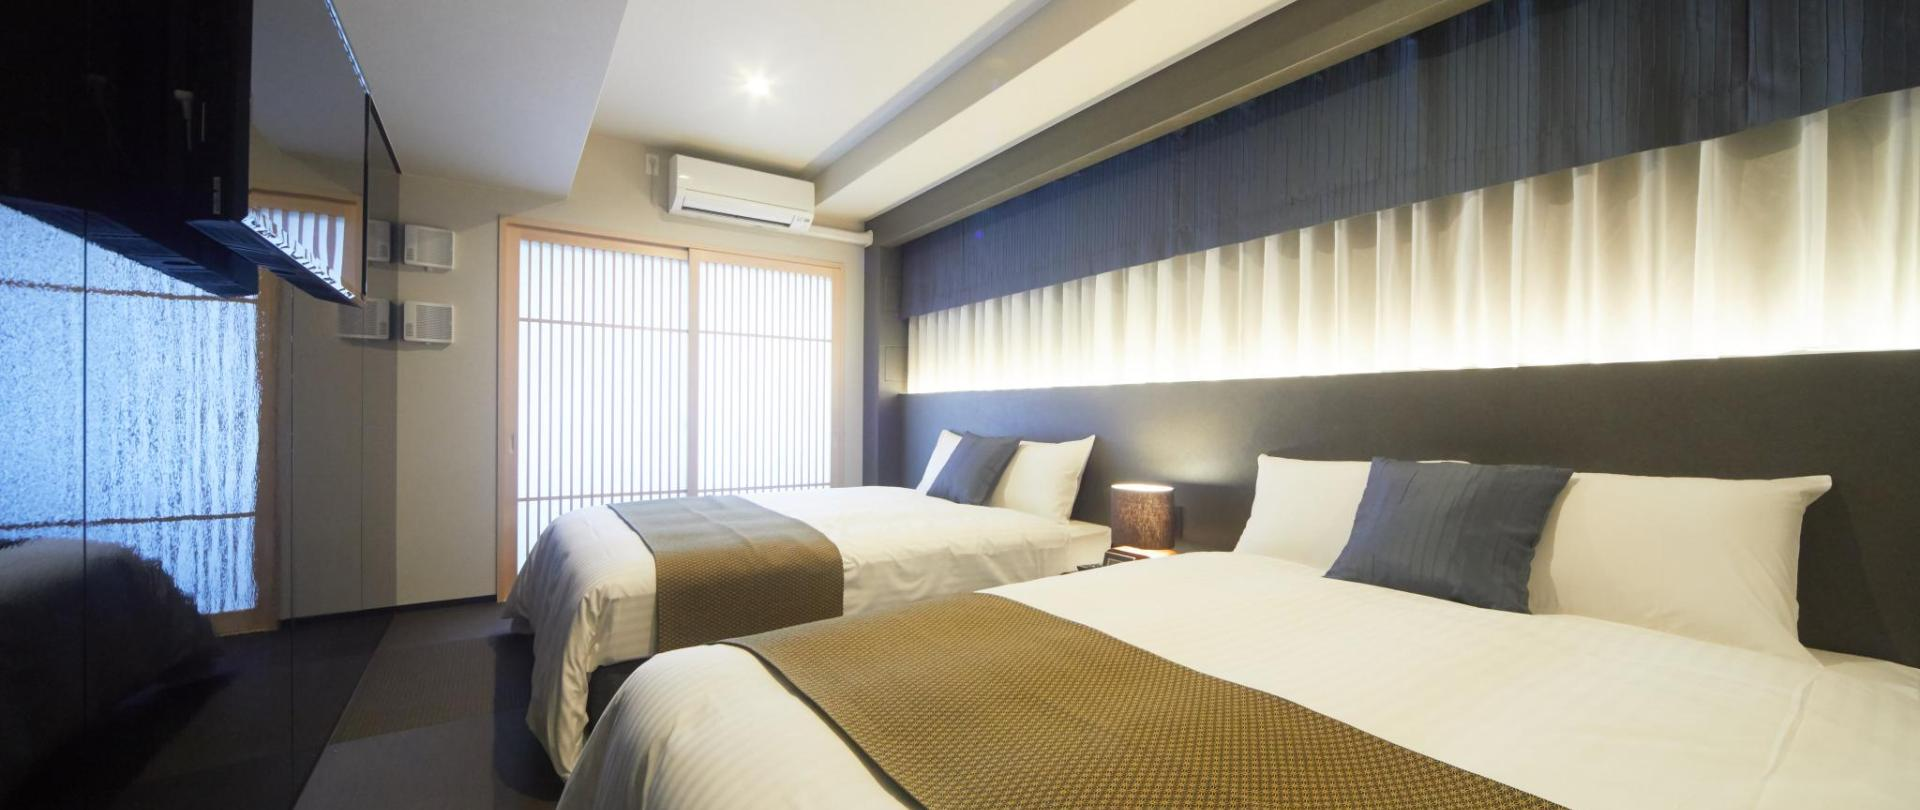 181217_HotelMondonce_139.jpg